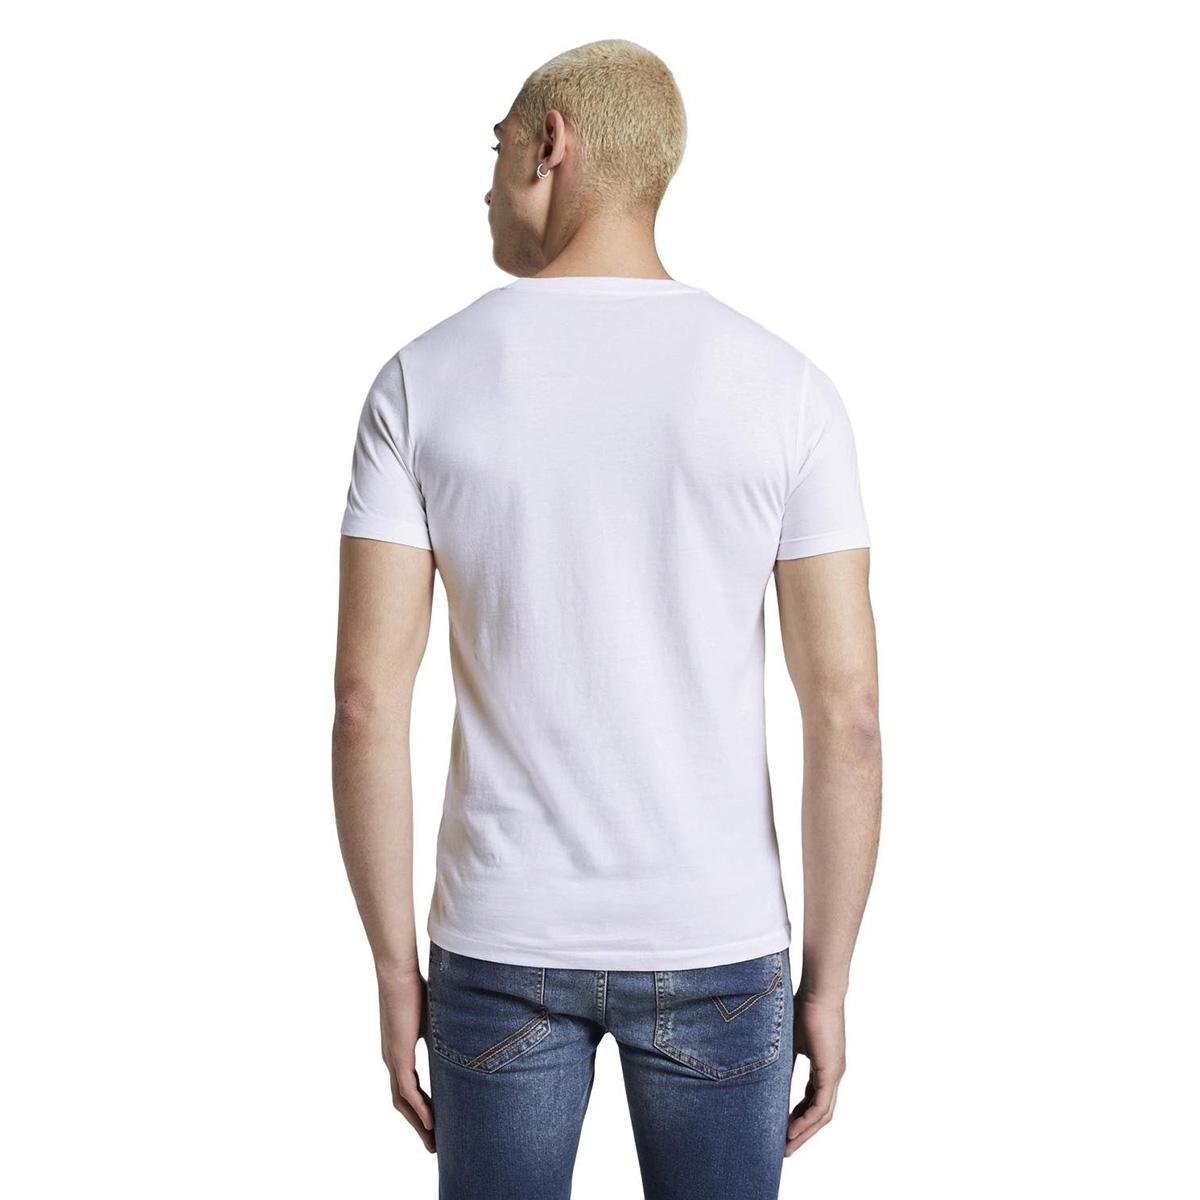 t shirt met print 1015938xx12 tom tailor t-shirt 20000